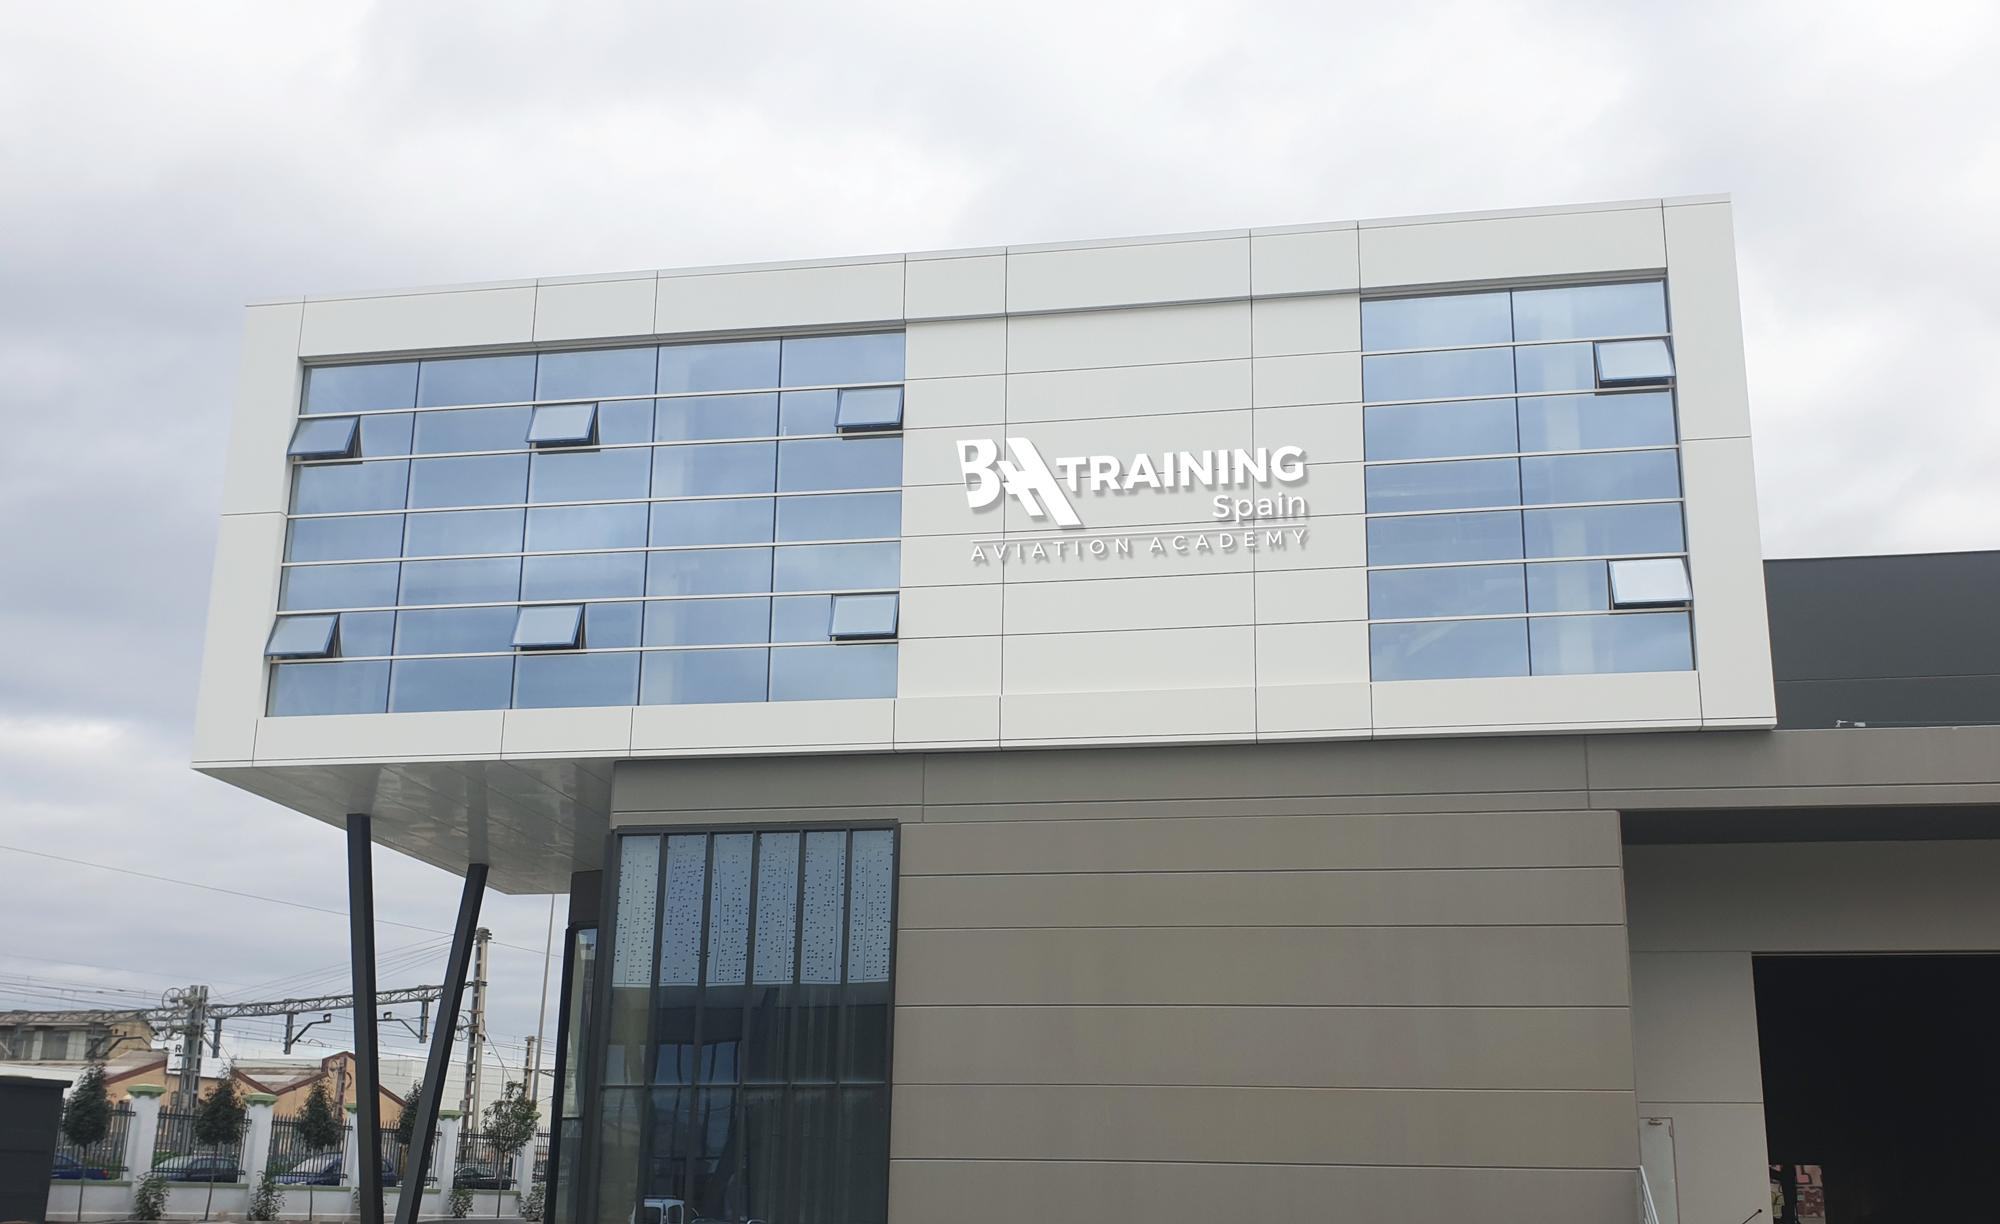 BAA Training Spain